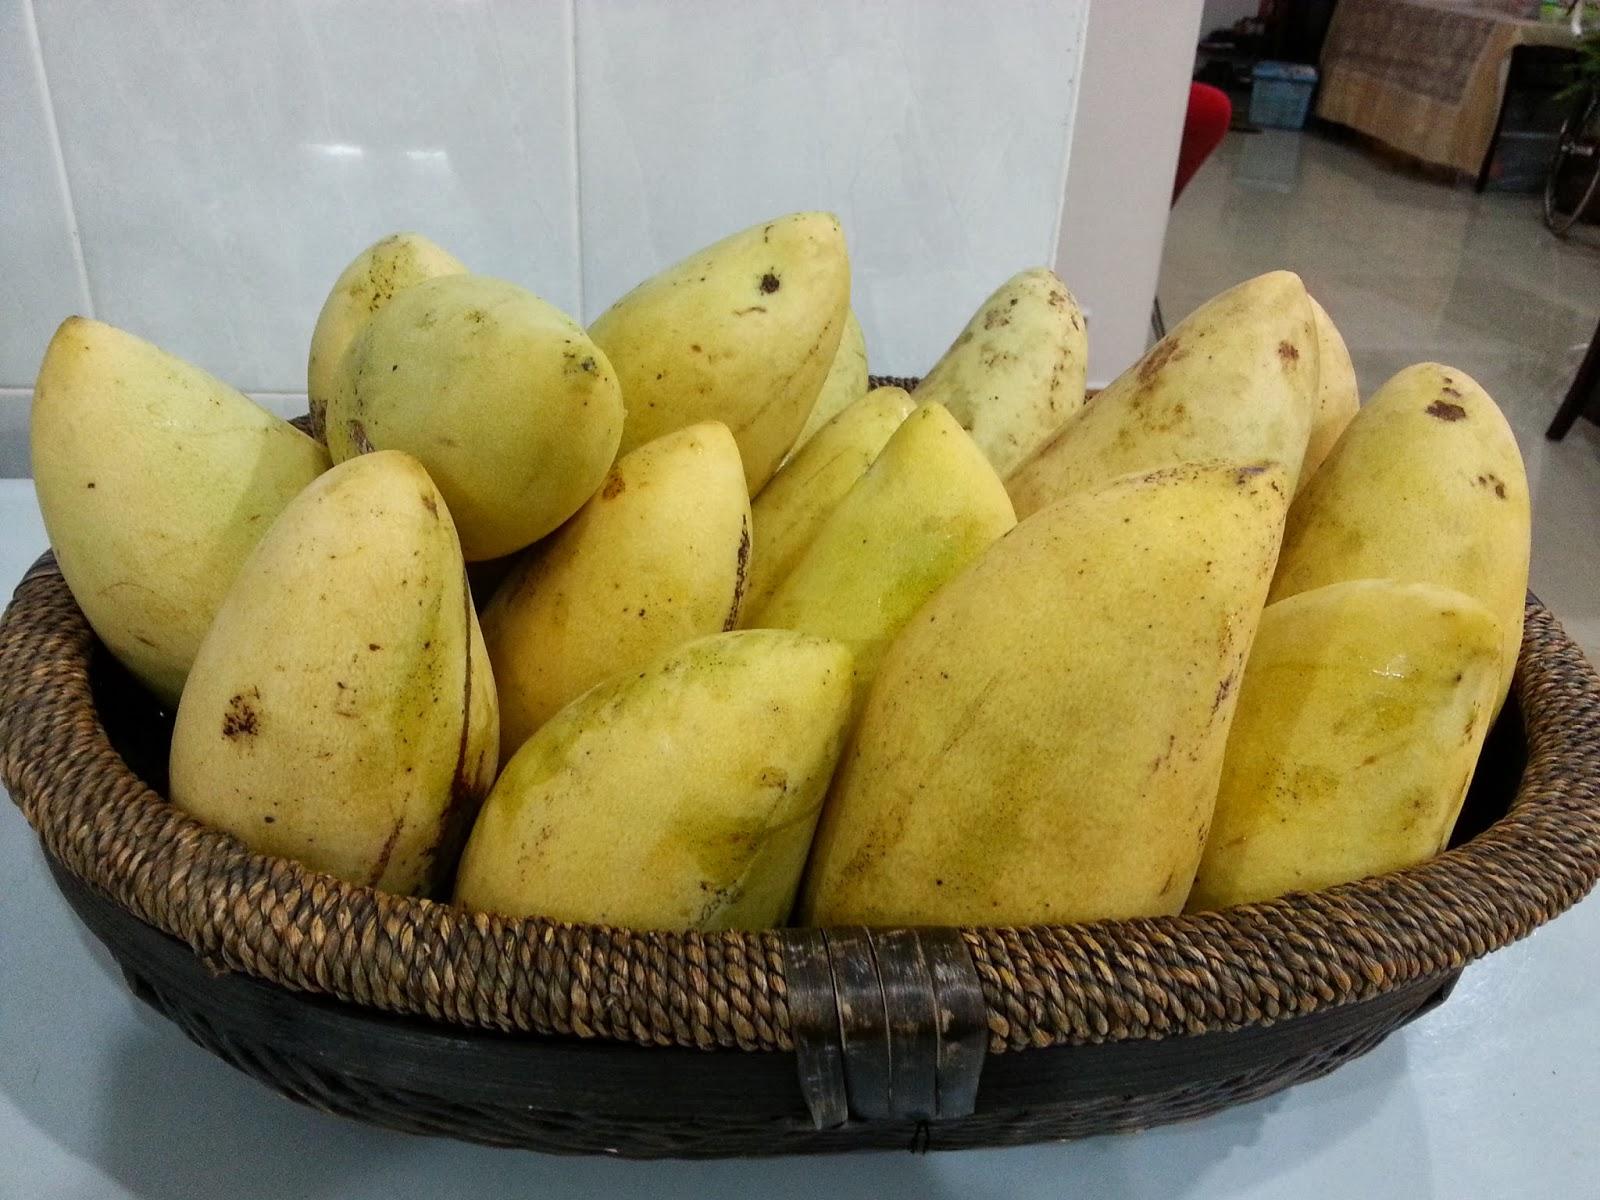 Thailand Rainbow Mango Lily Mangoes From Thailand